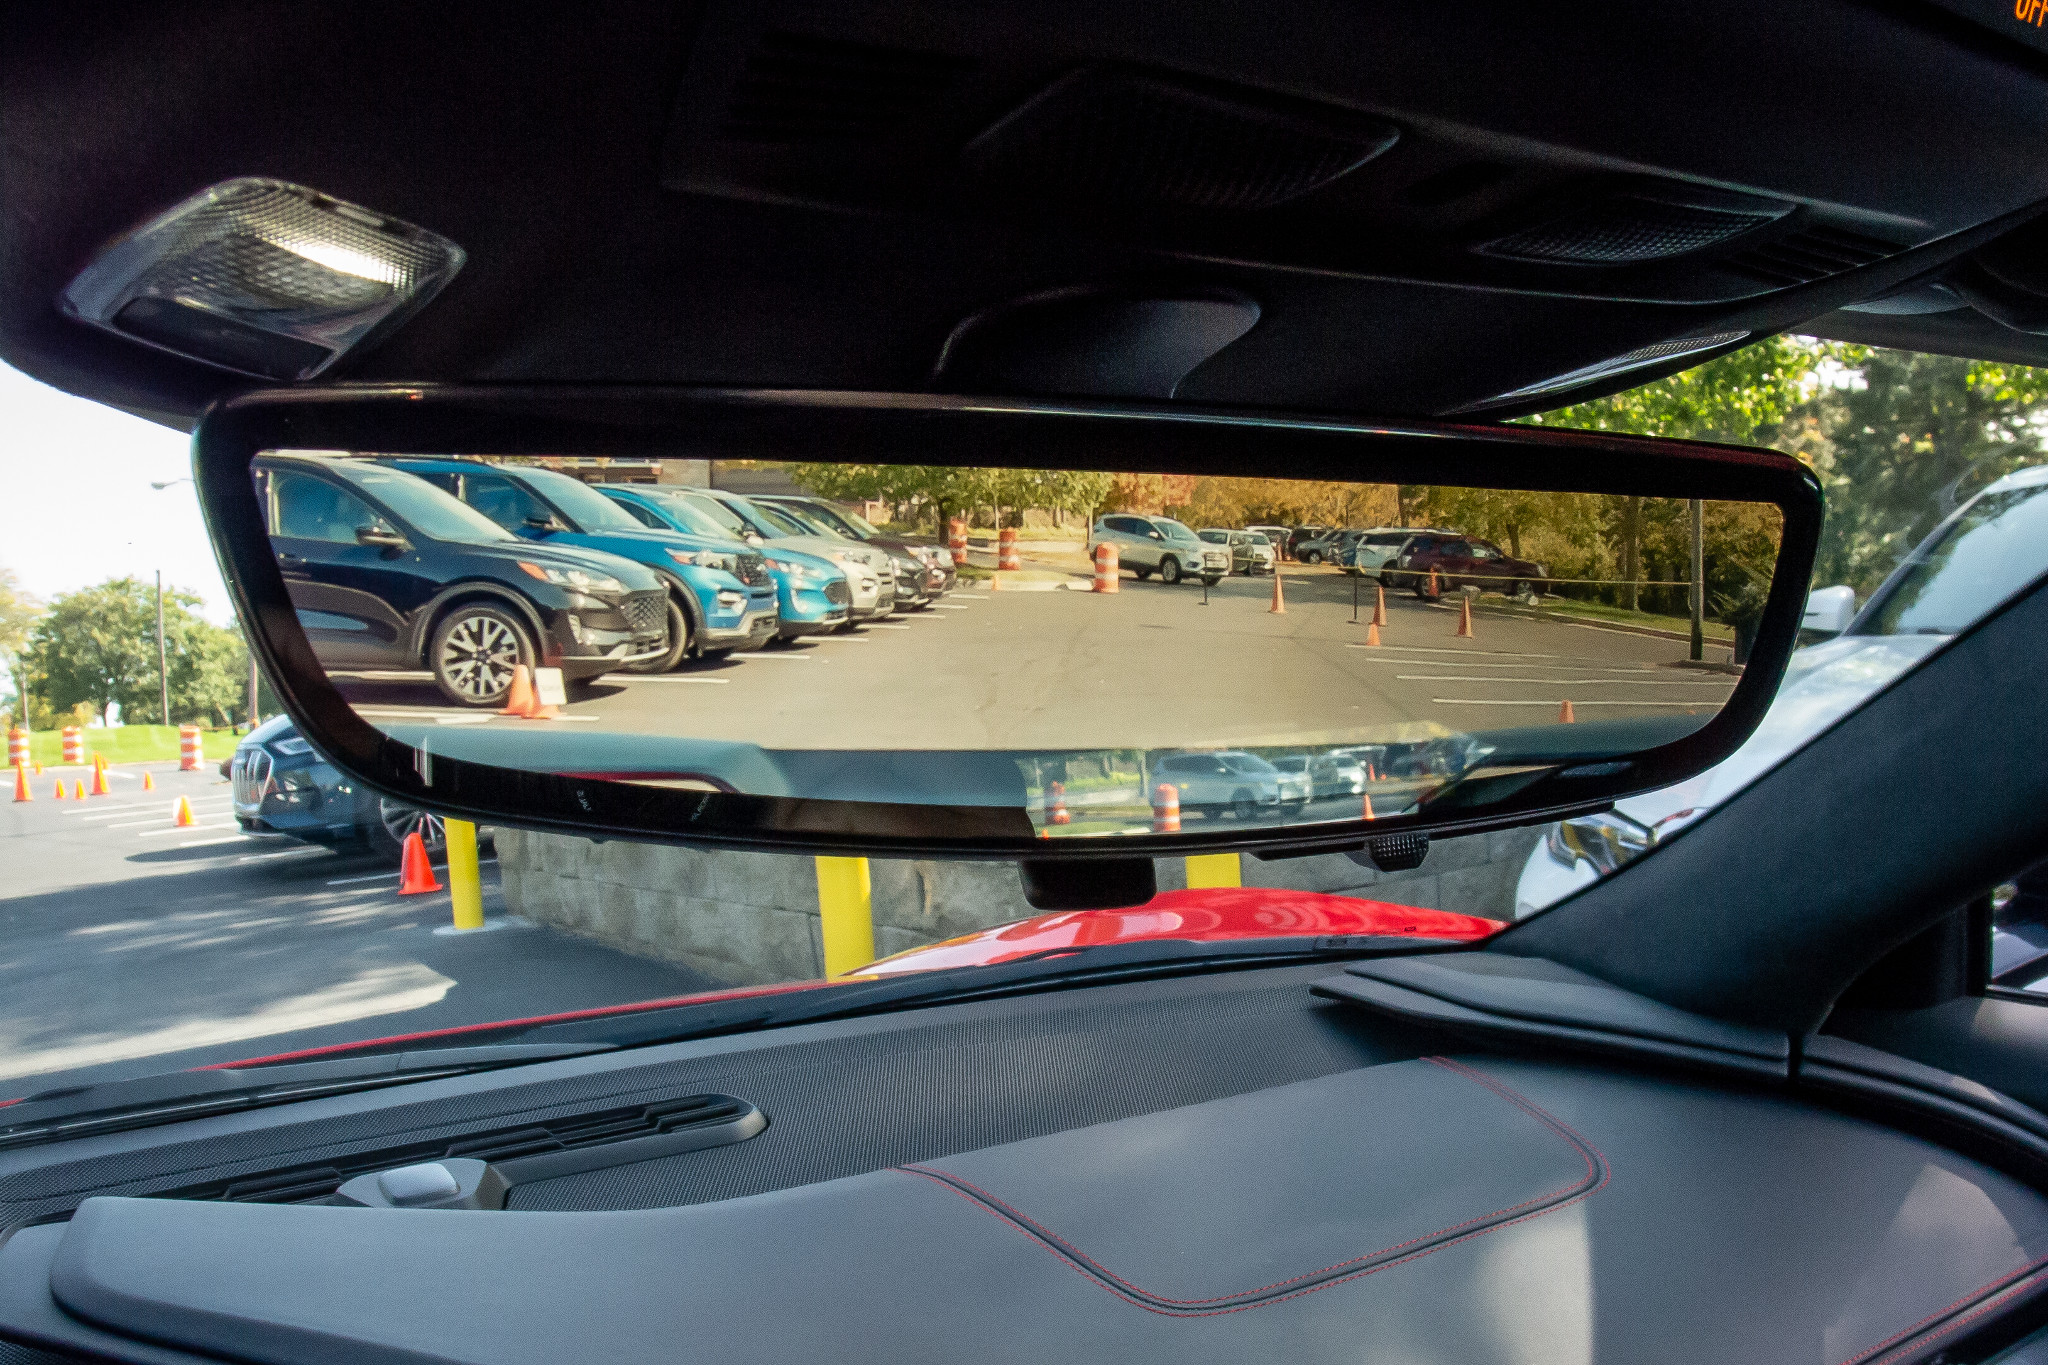 chevrolet-corvette-z51-2020-21-interior--rearview-mirror.jpg